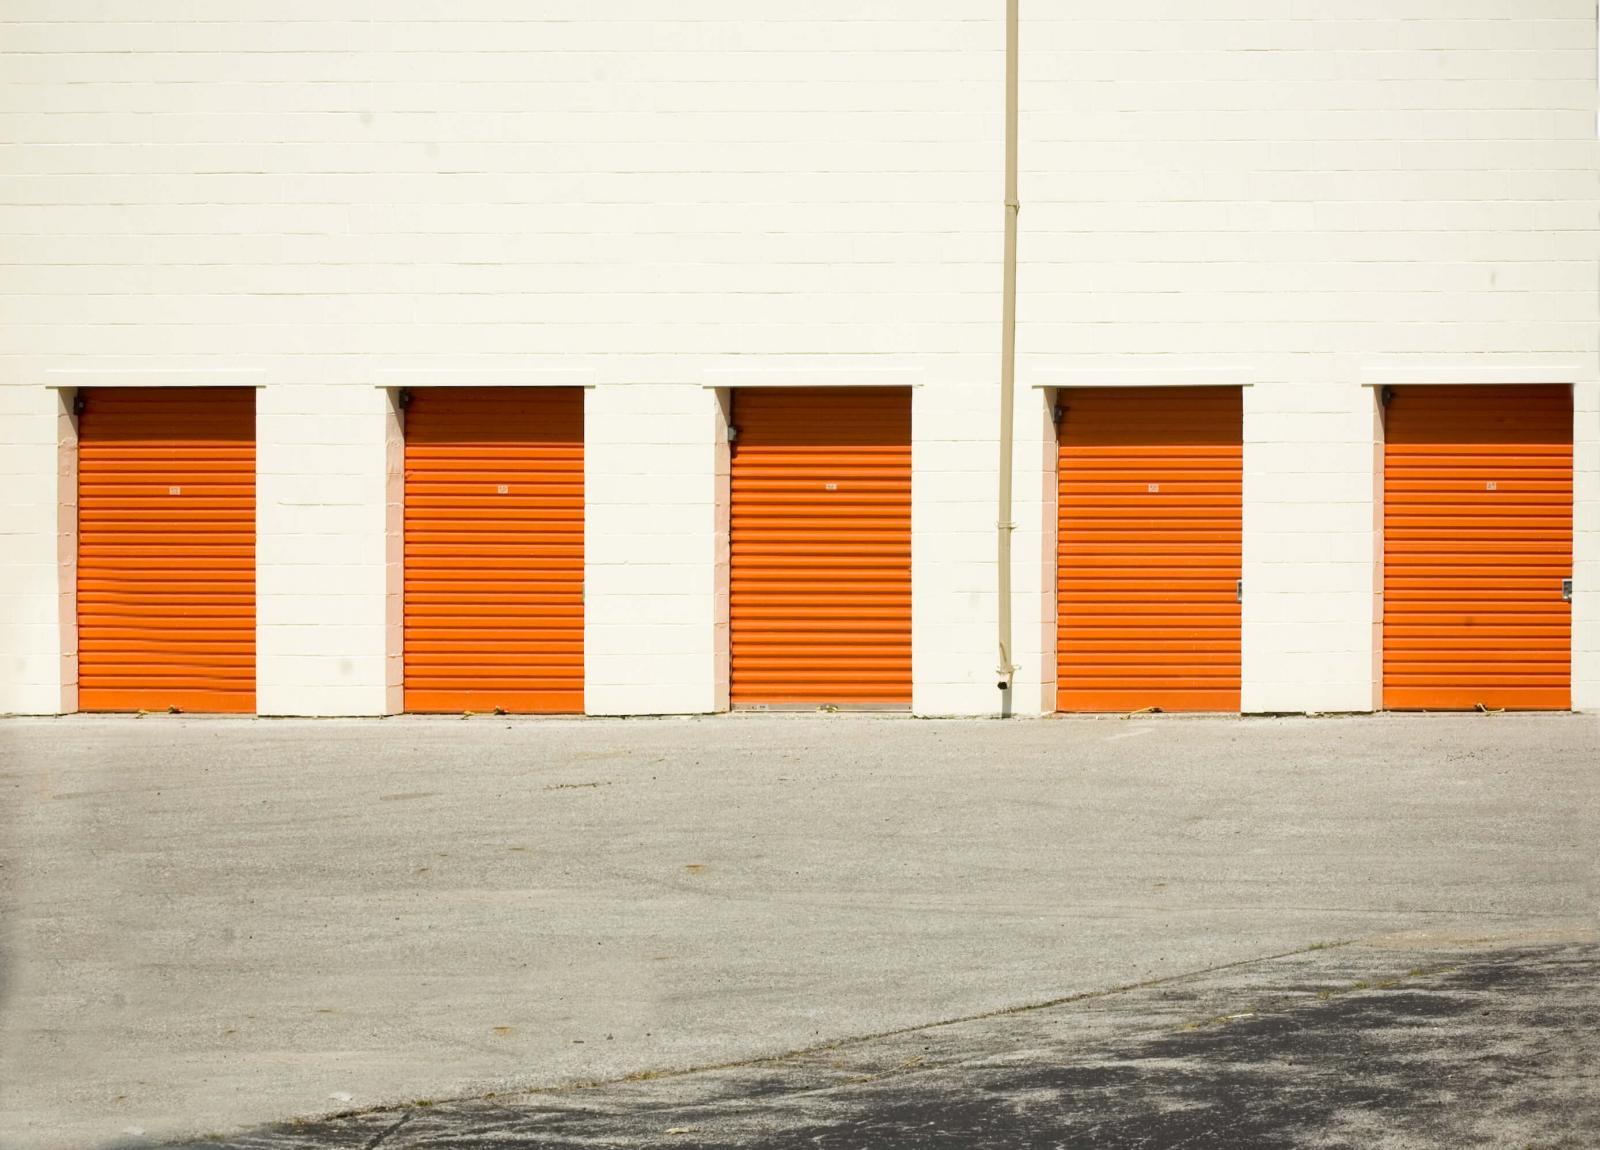 Orange storage units